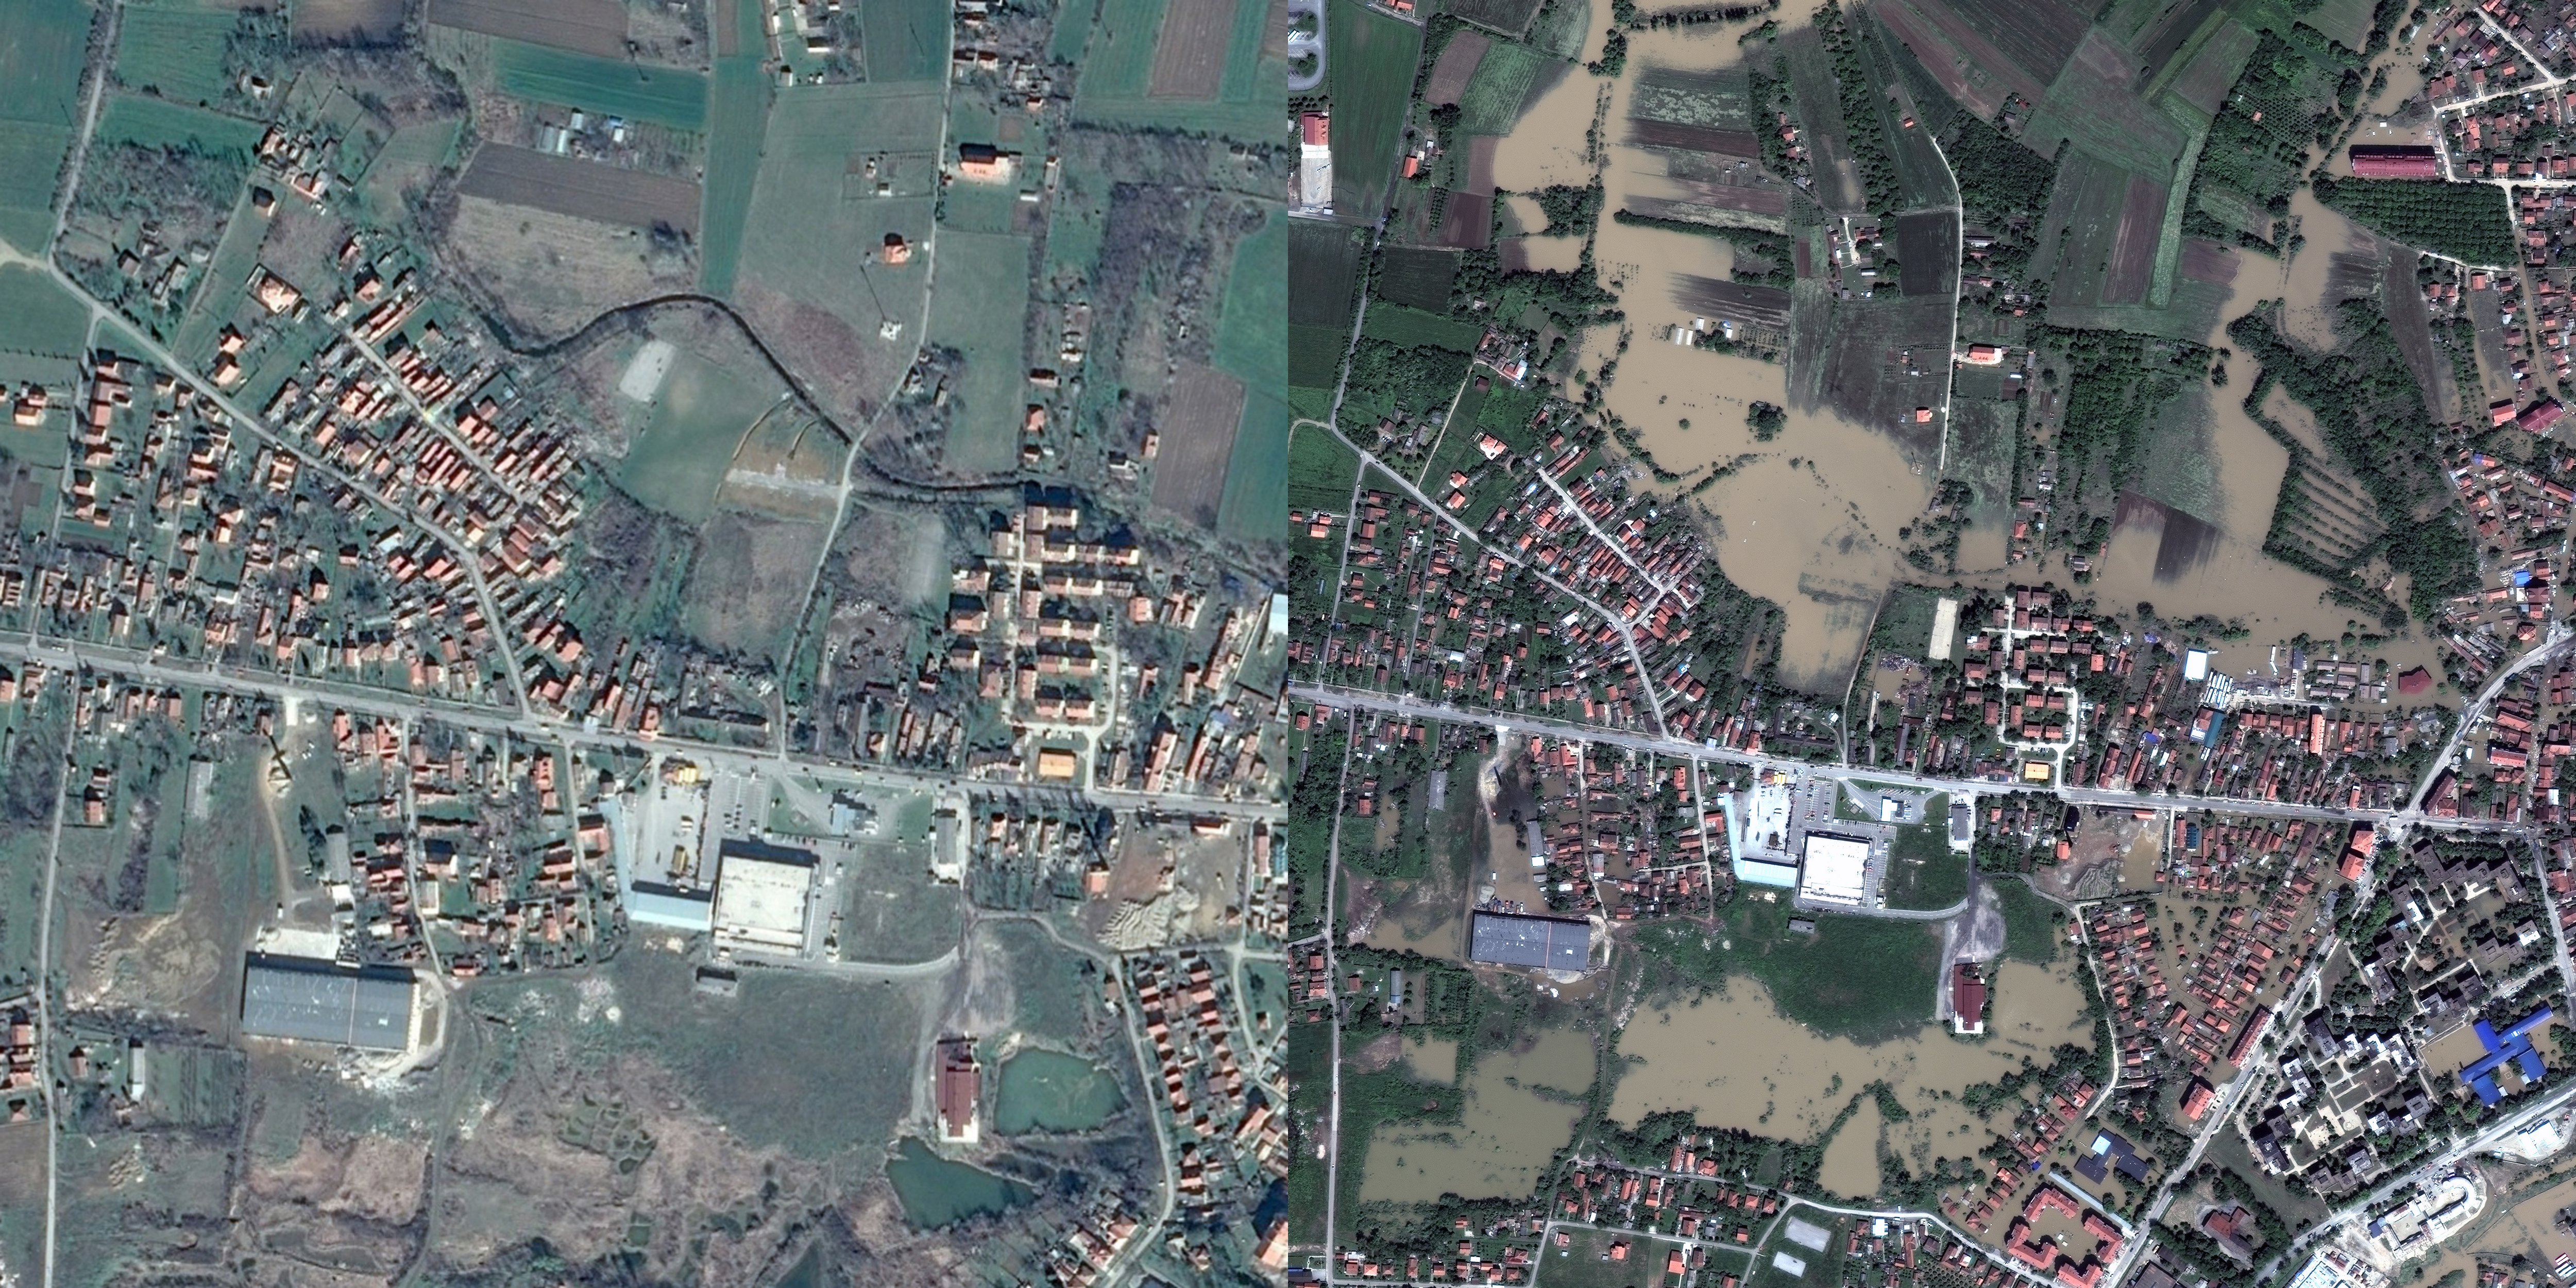 Left: Obrenovac, Serbia before floods.                               Right: Obrenovac, Serbia May 21, 2014.